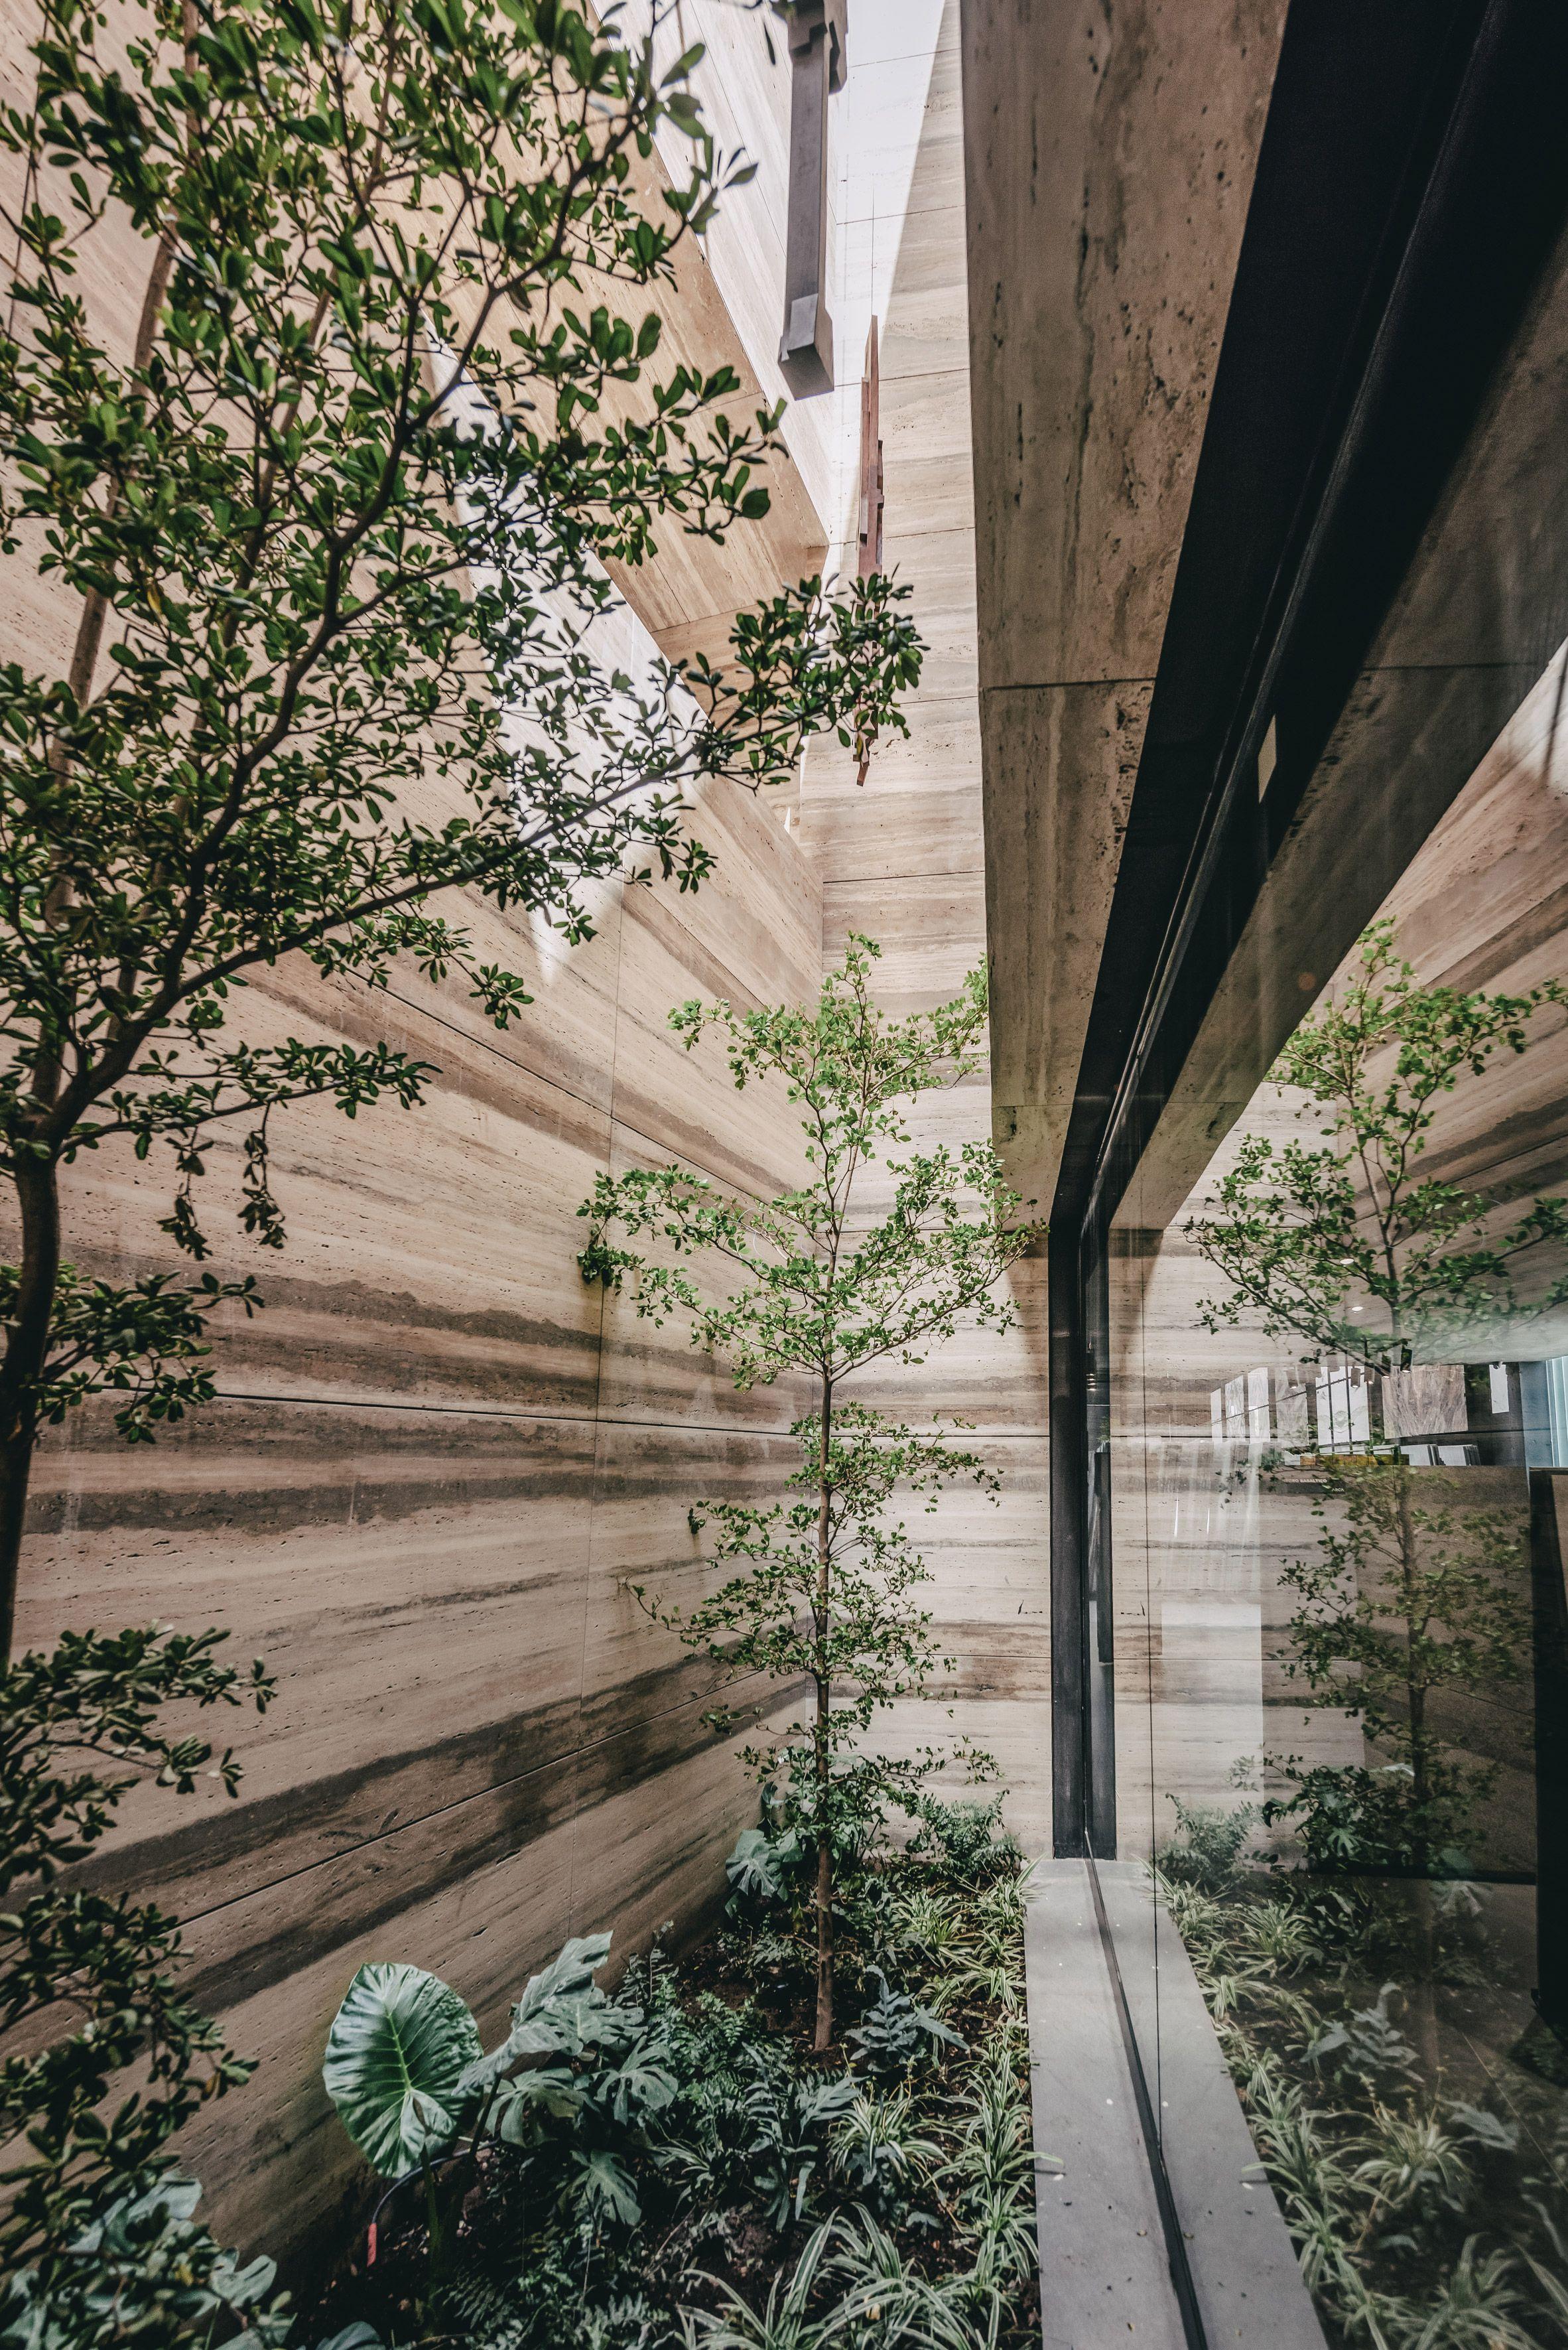 Grupo Arca Showroom Set In A Landscape Of Quarried Stone Norwegian Architecture Landscape Rural Architecture